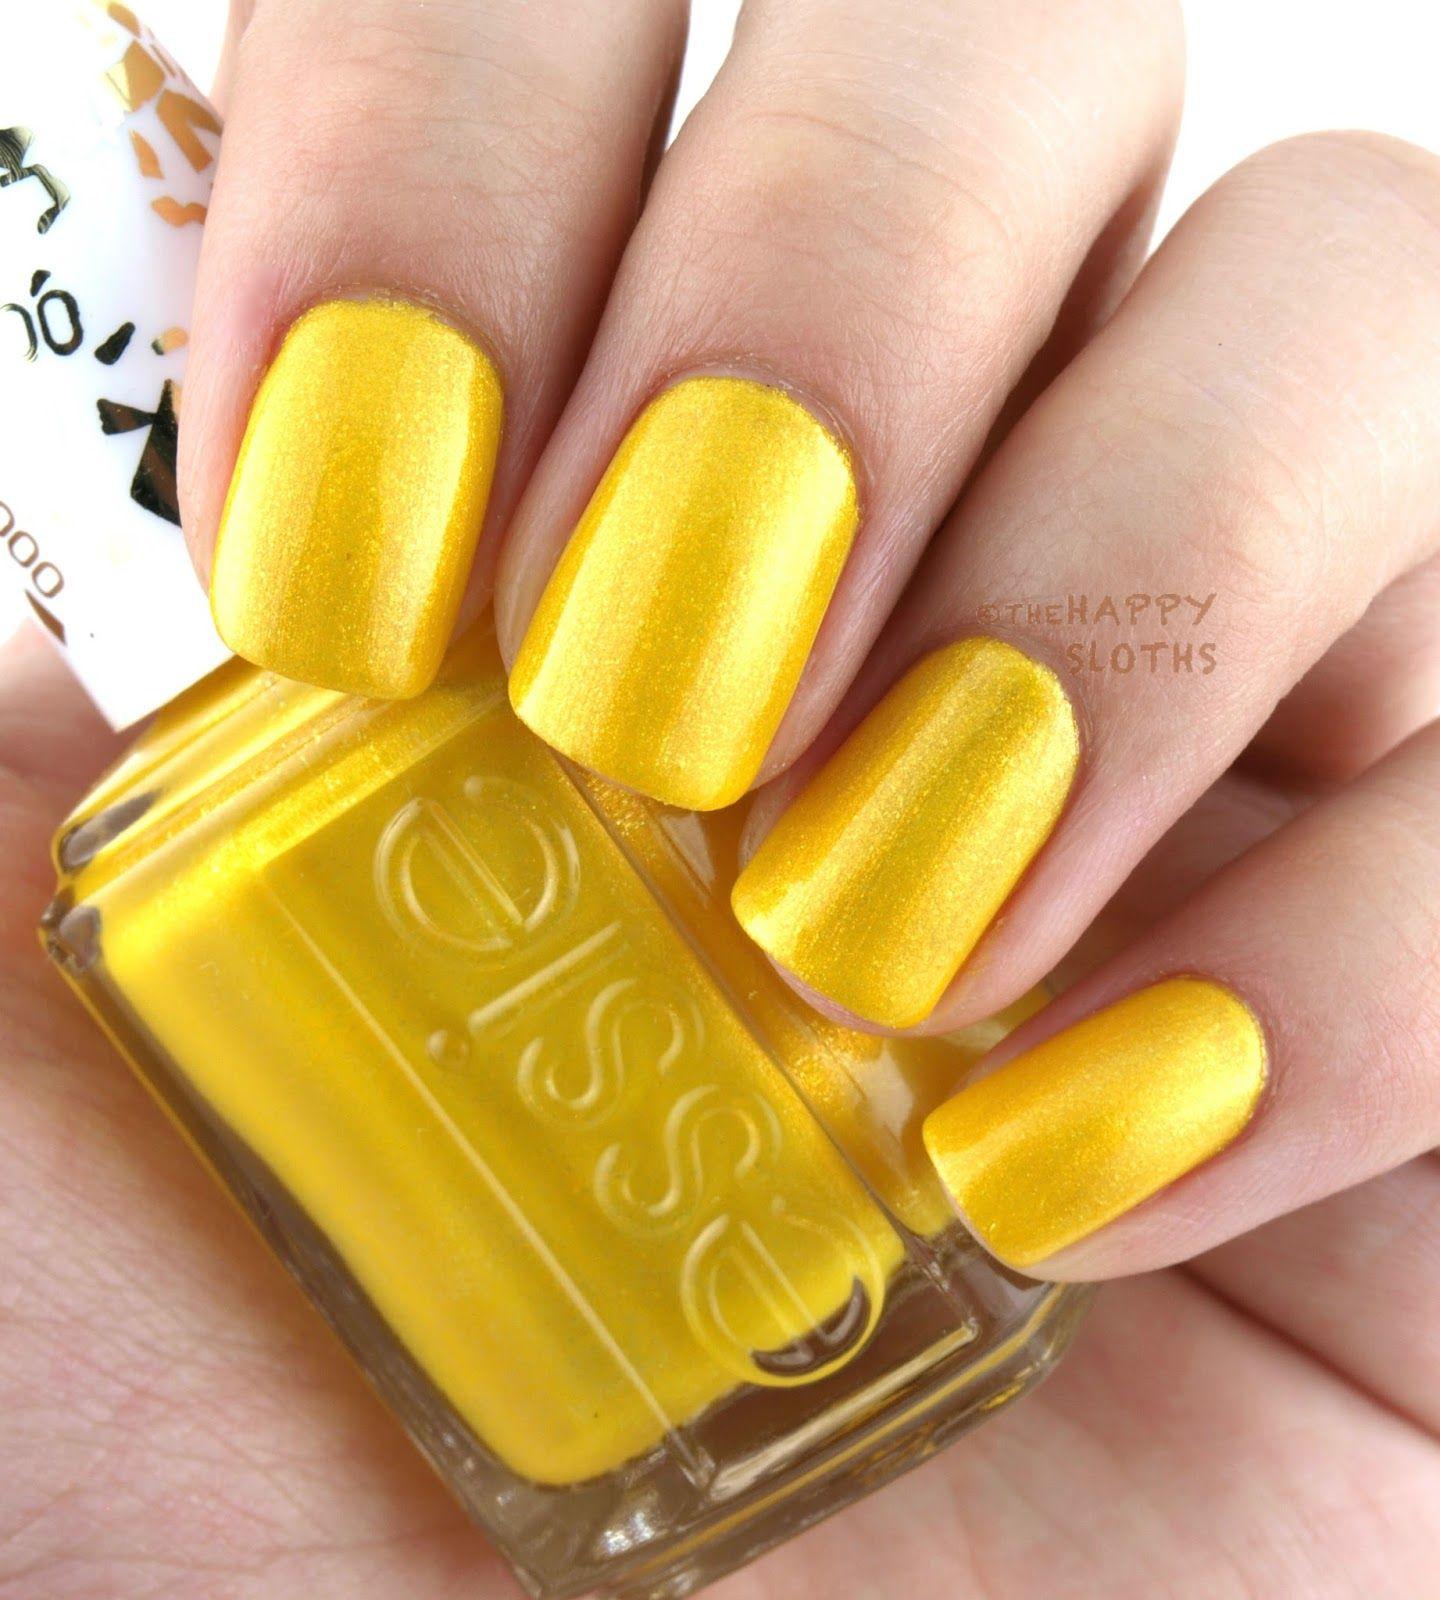 Essie 1000th Shade: Aim to Misbehave | Sloth, Essie nail polish and ...